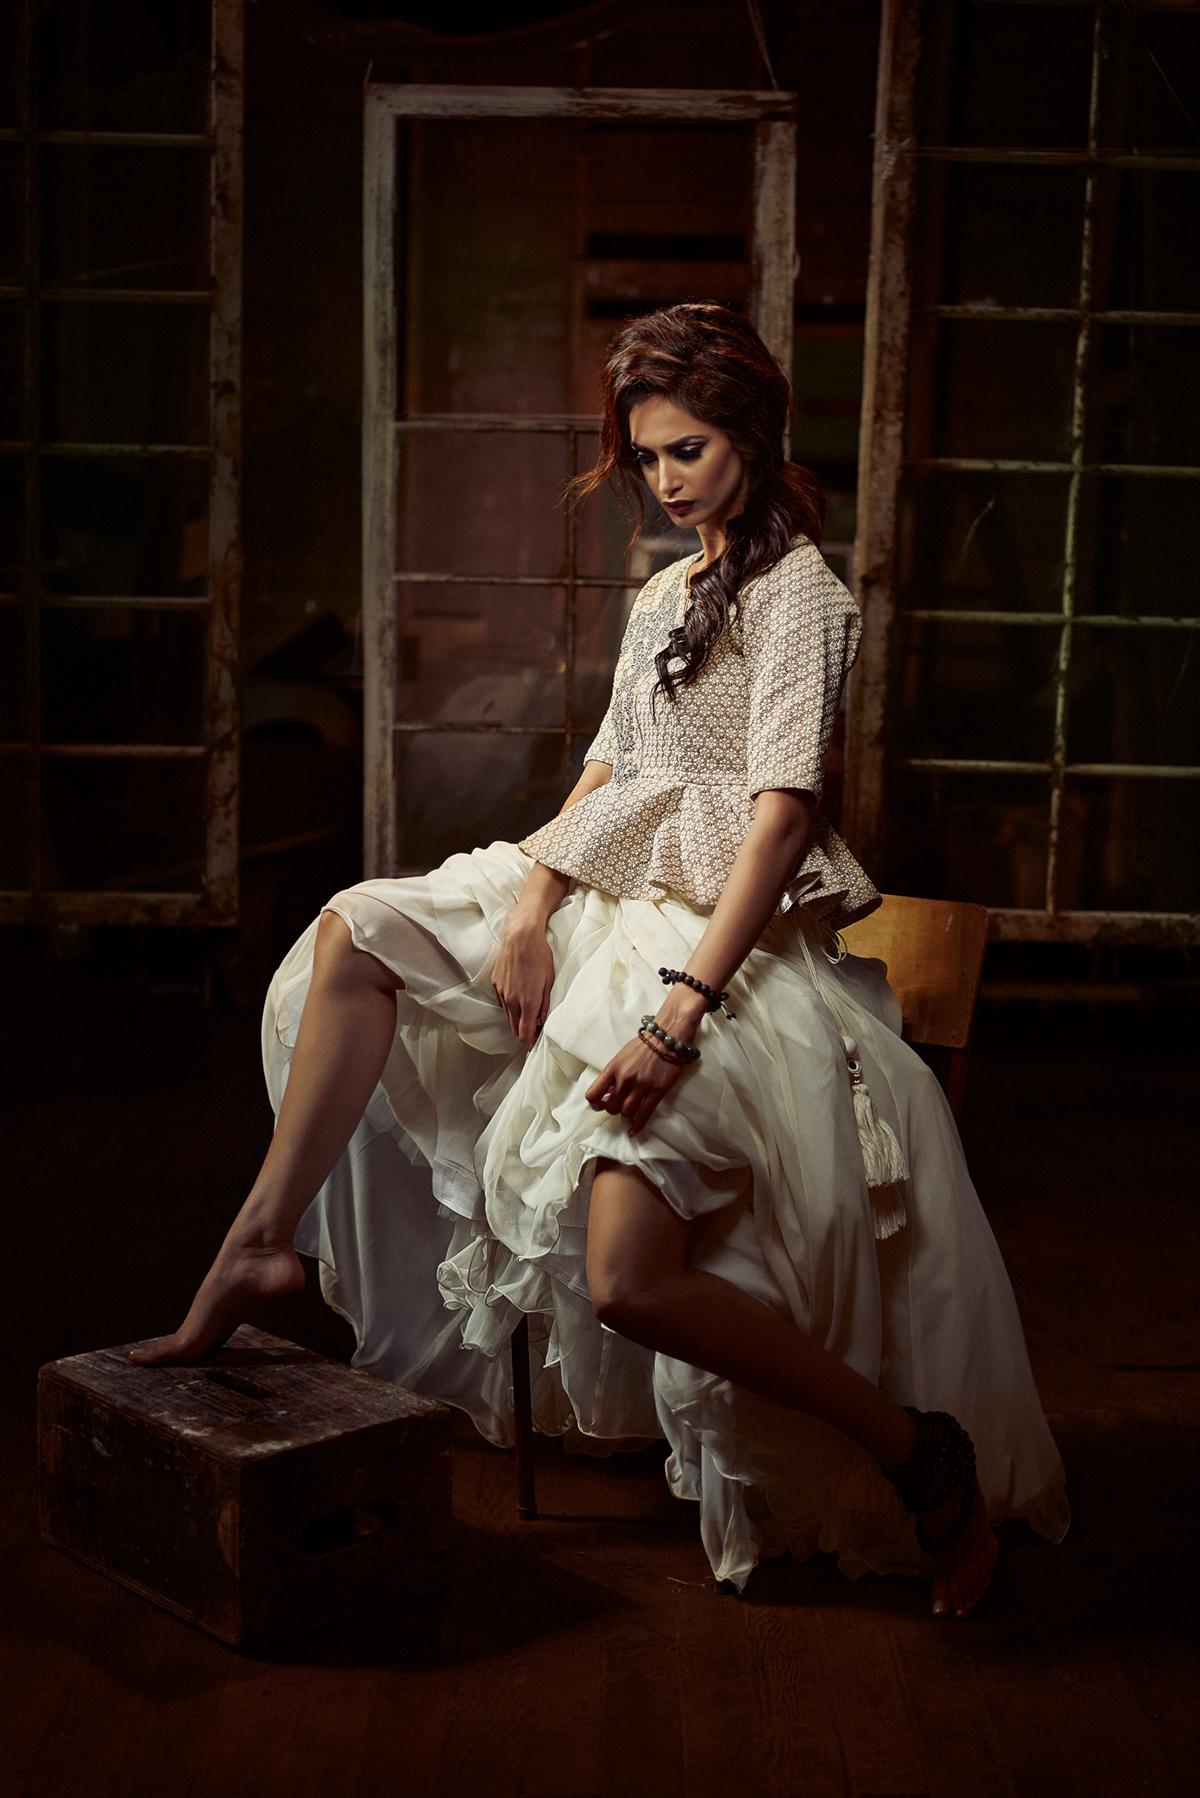 Photography: @deostudios Outfit: @sunnysbridal Photography: @deostudios Makeup & Concept: @farah_hsn Hair: @brandiqueenb Styling: @ronywalia #celebrationsmagazine#spring2015 #magazine #fashion #beauty#offthestands #pickupyourcopy #fashionmagazines#fashion #beauty #lifestyle #editorial #readingtime#pages #recipes #reading #models #photography#ronywalia #jessielehail #arpaandressedme#farahhasan #indianwedding #indianbride#vancouverwedding #bridal #fashiontrends#bollywood #indianfashion